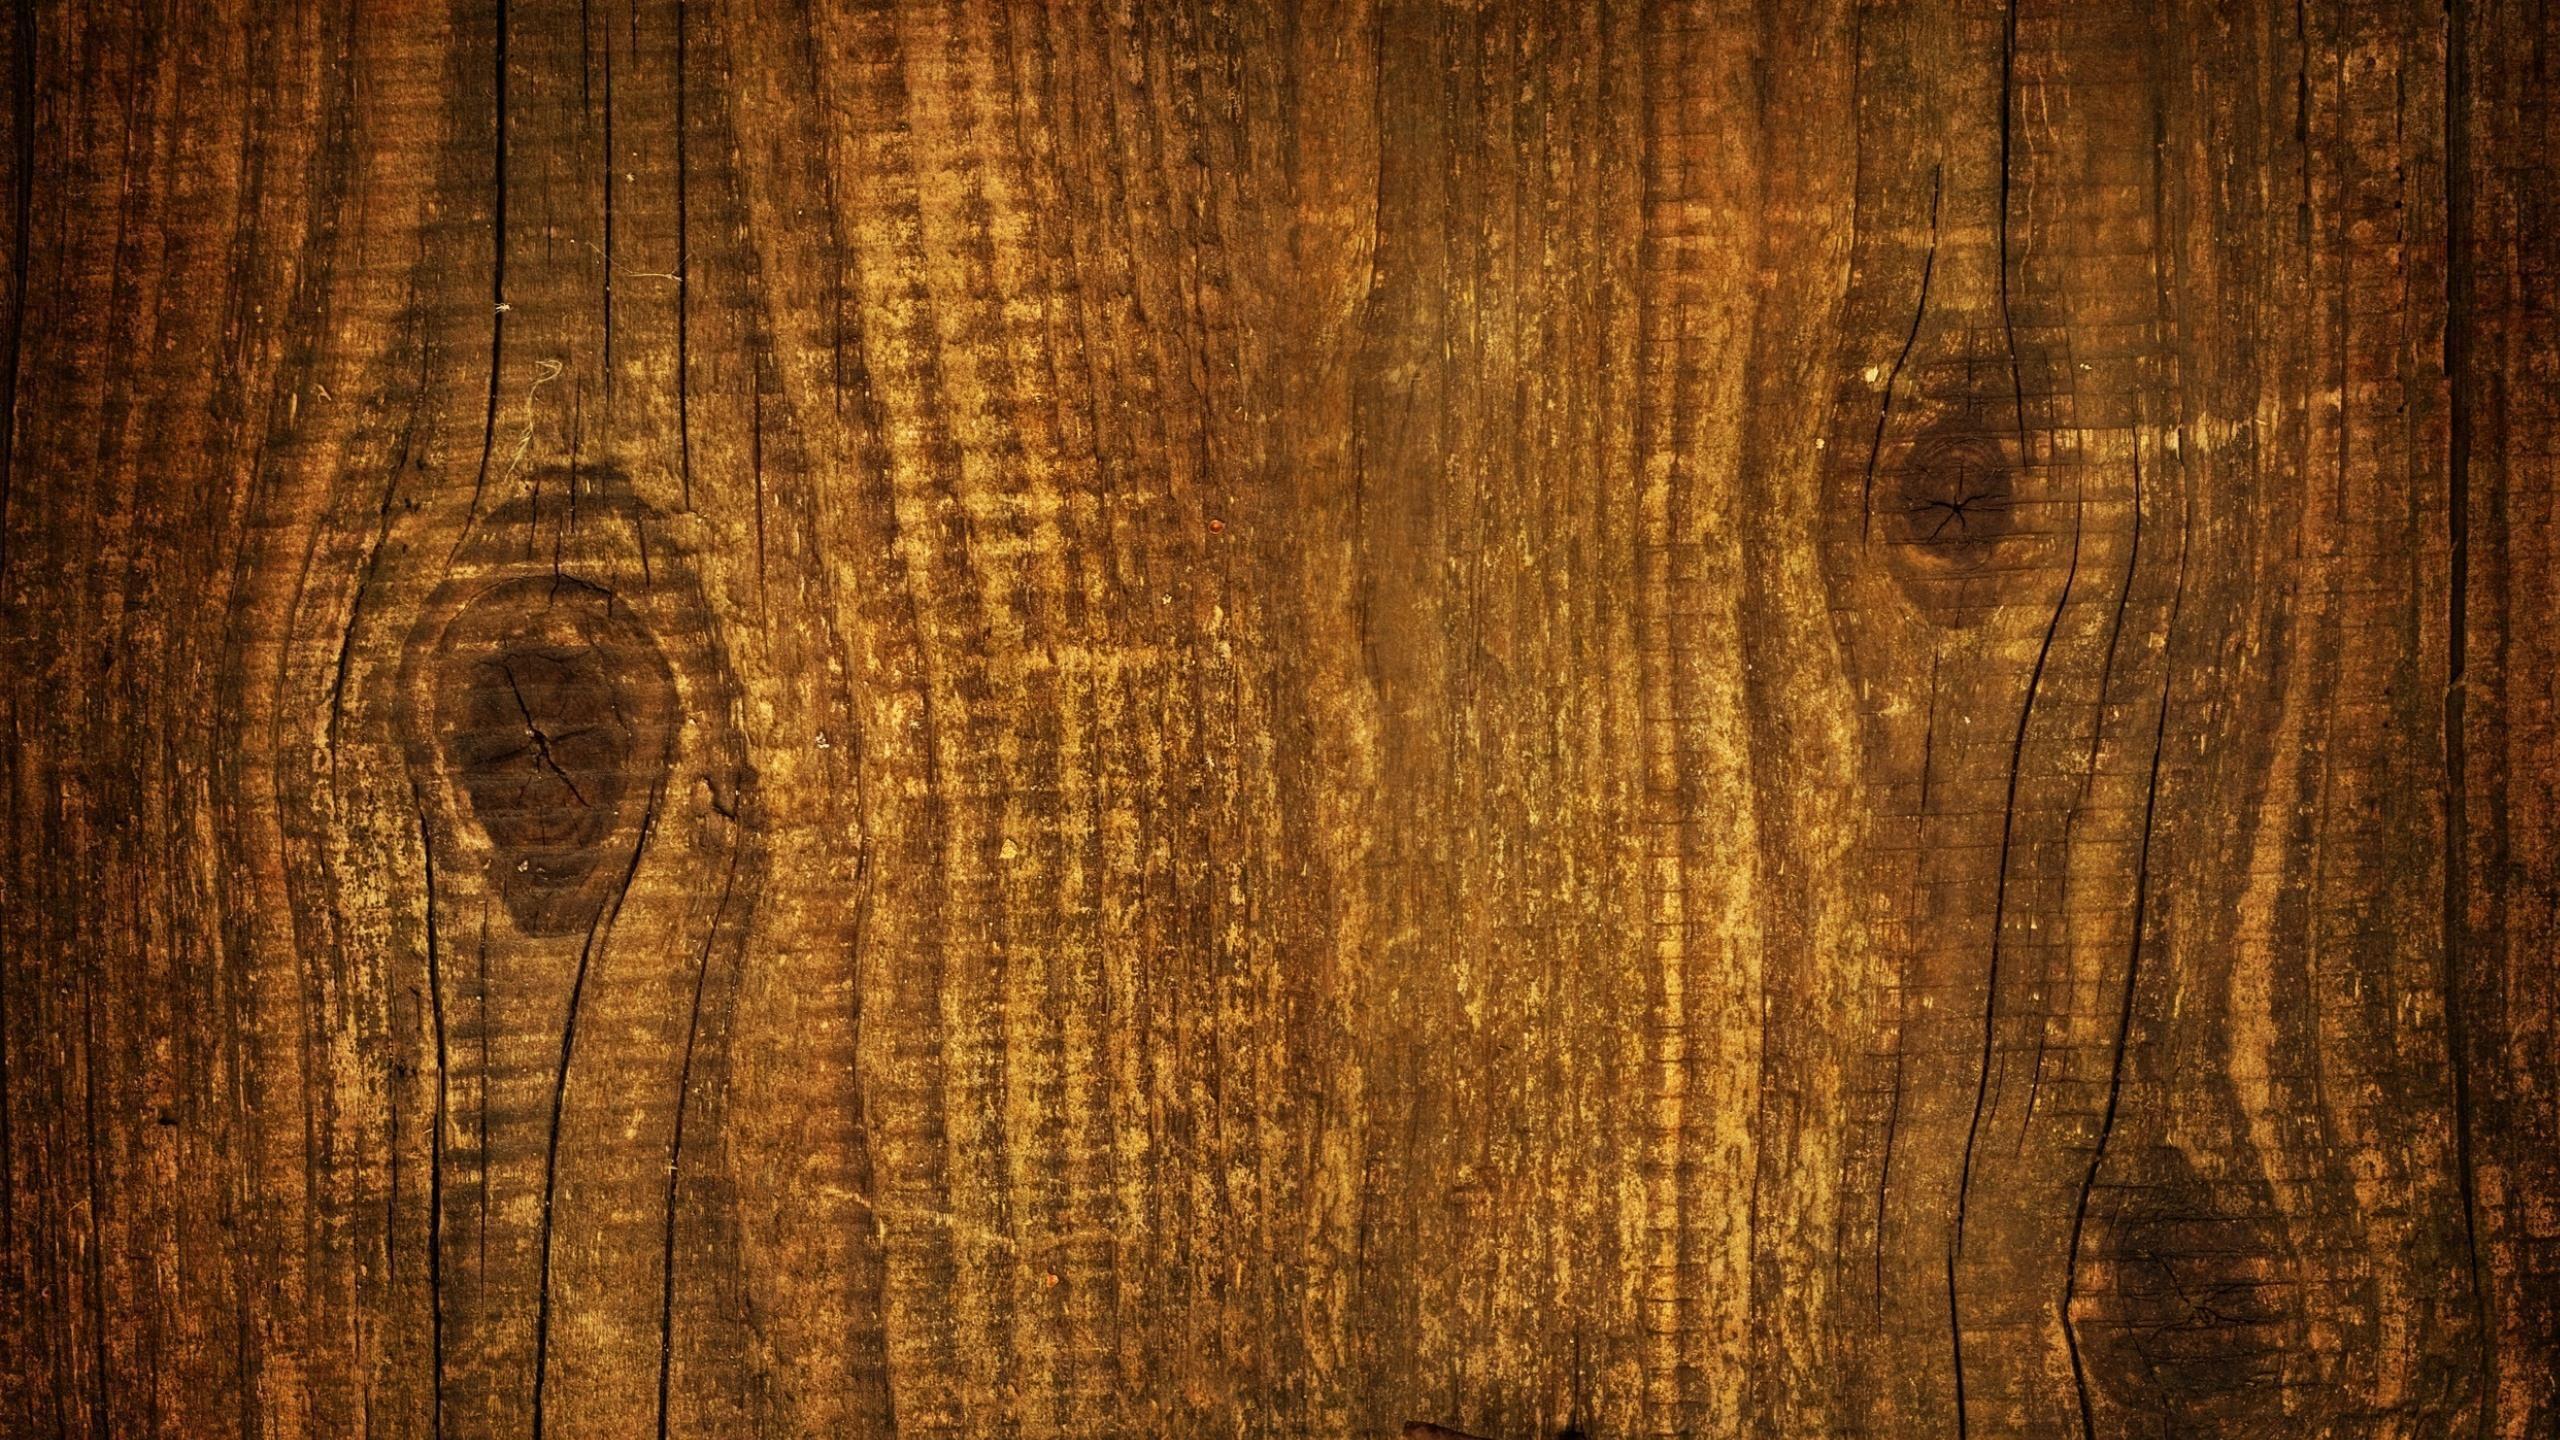 Wood Grain Texture wood grain texture wallpaper #29950 - resolution 2560x1440 px